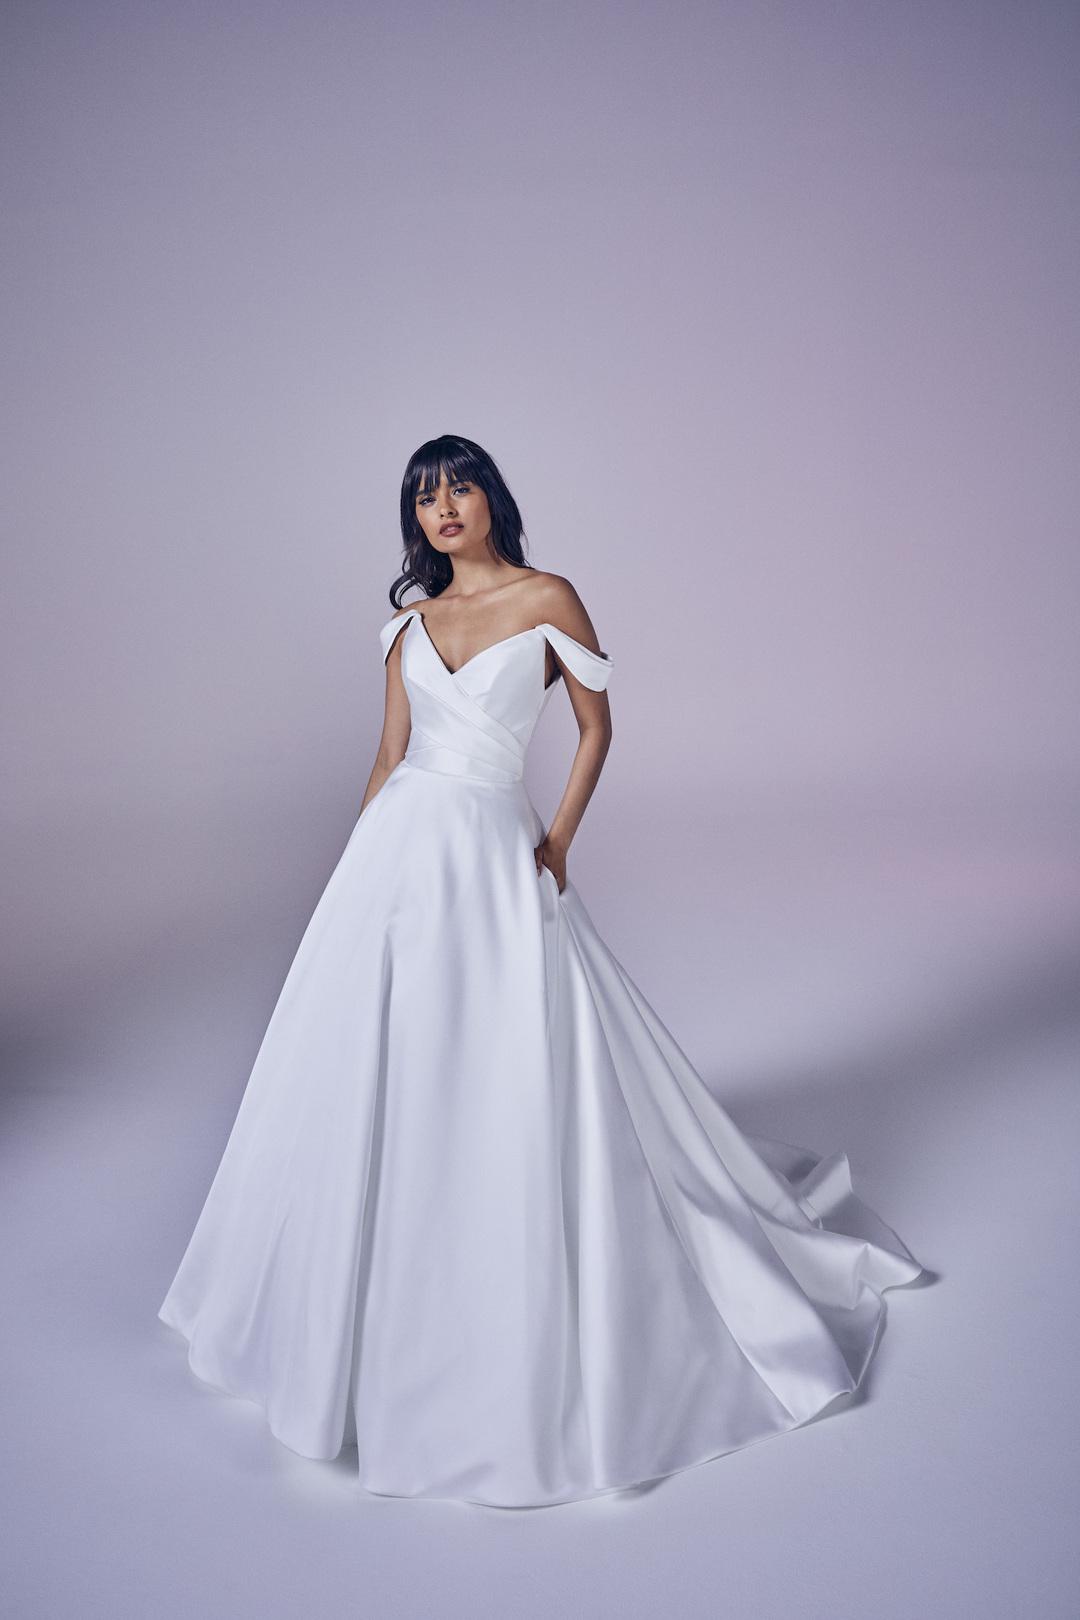 viola dress photo